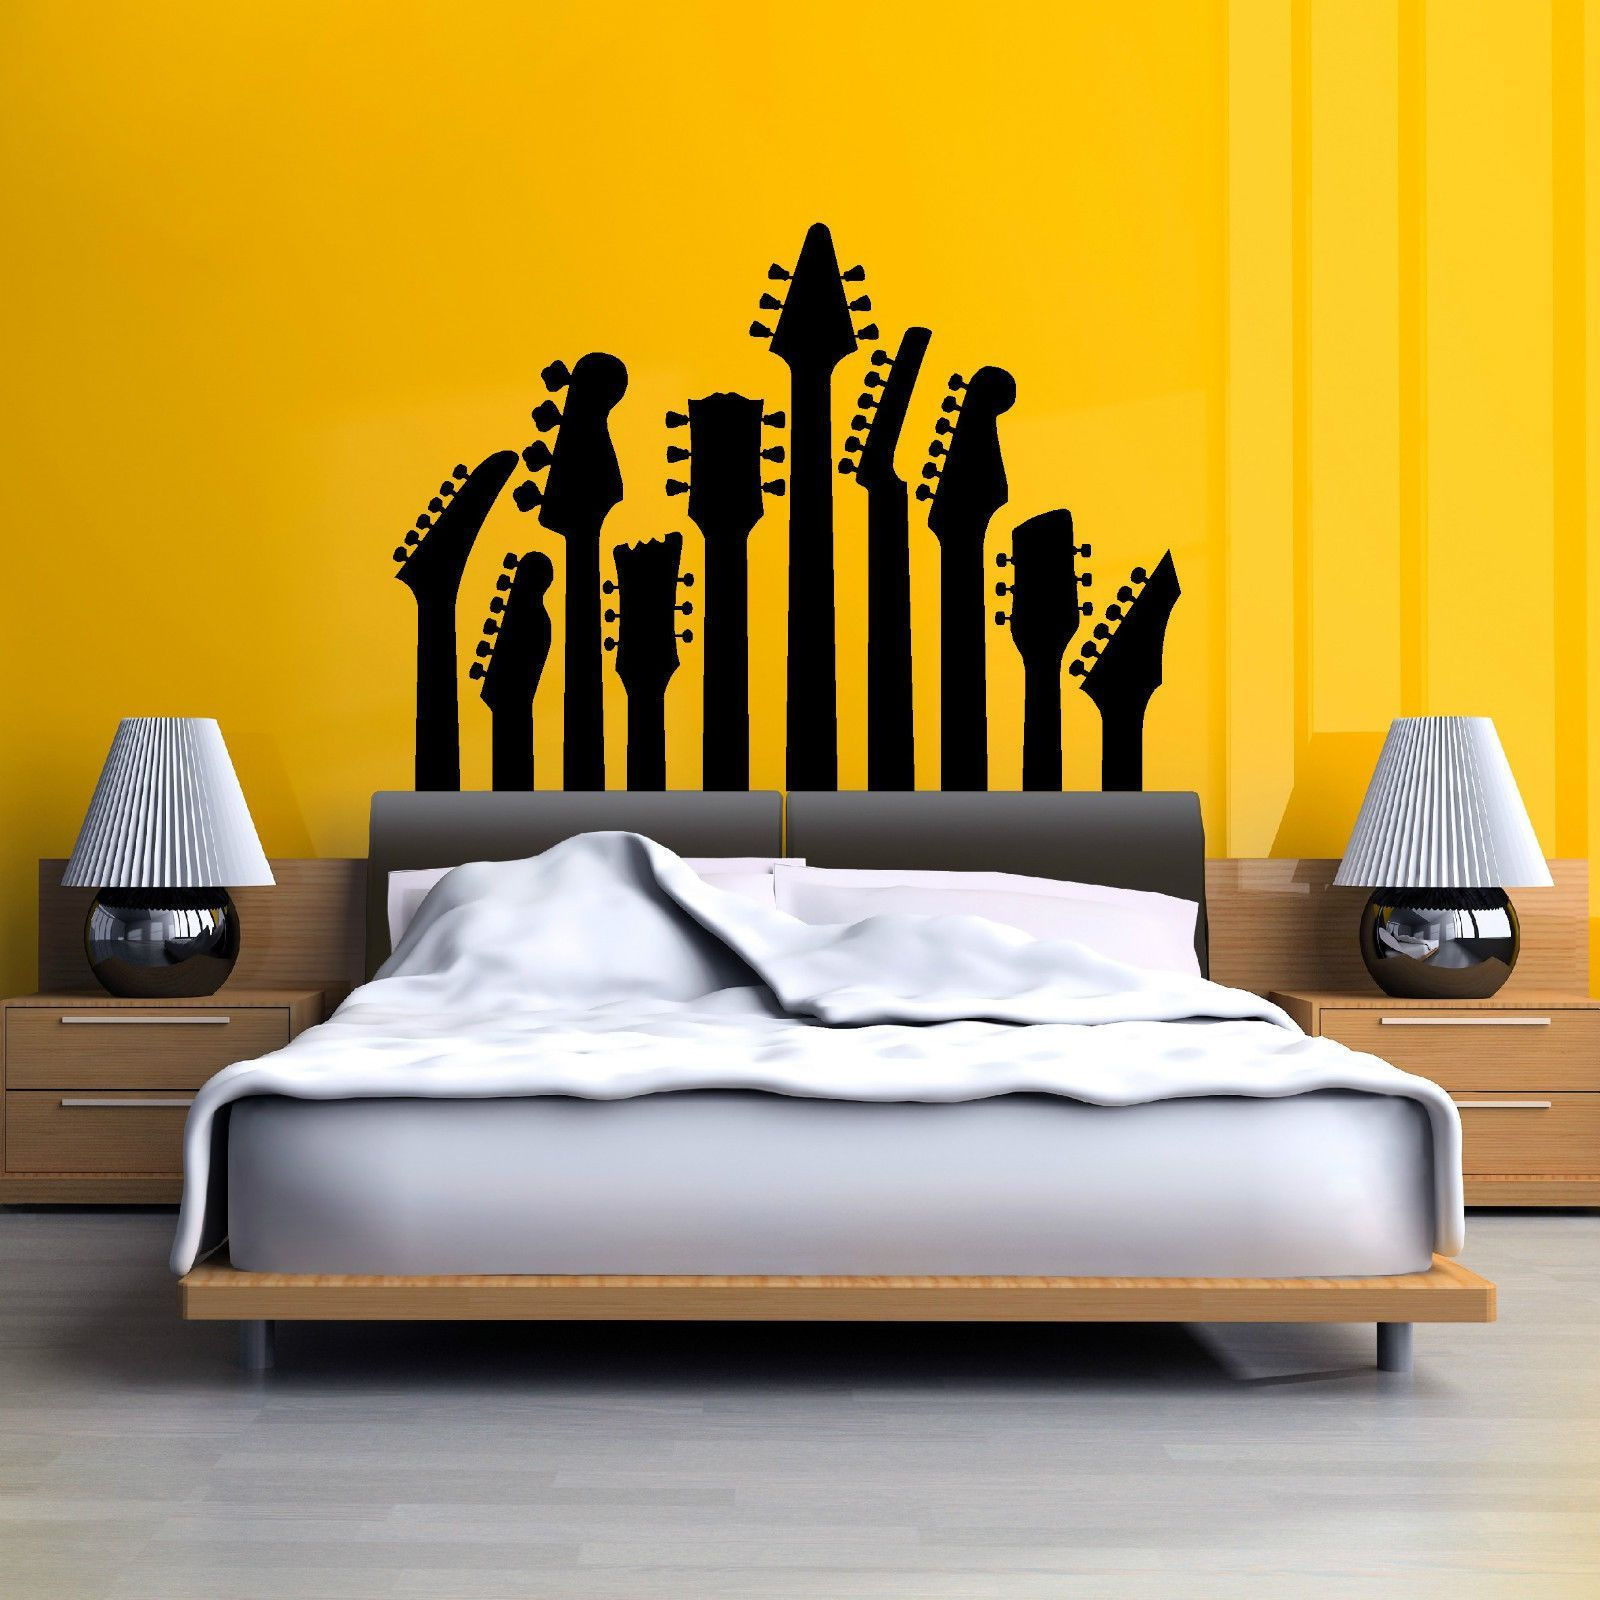 23 DIY Steampunk Bedroom Decor Ideas & Designs, Accessories and Art ...